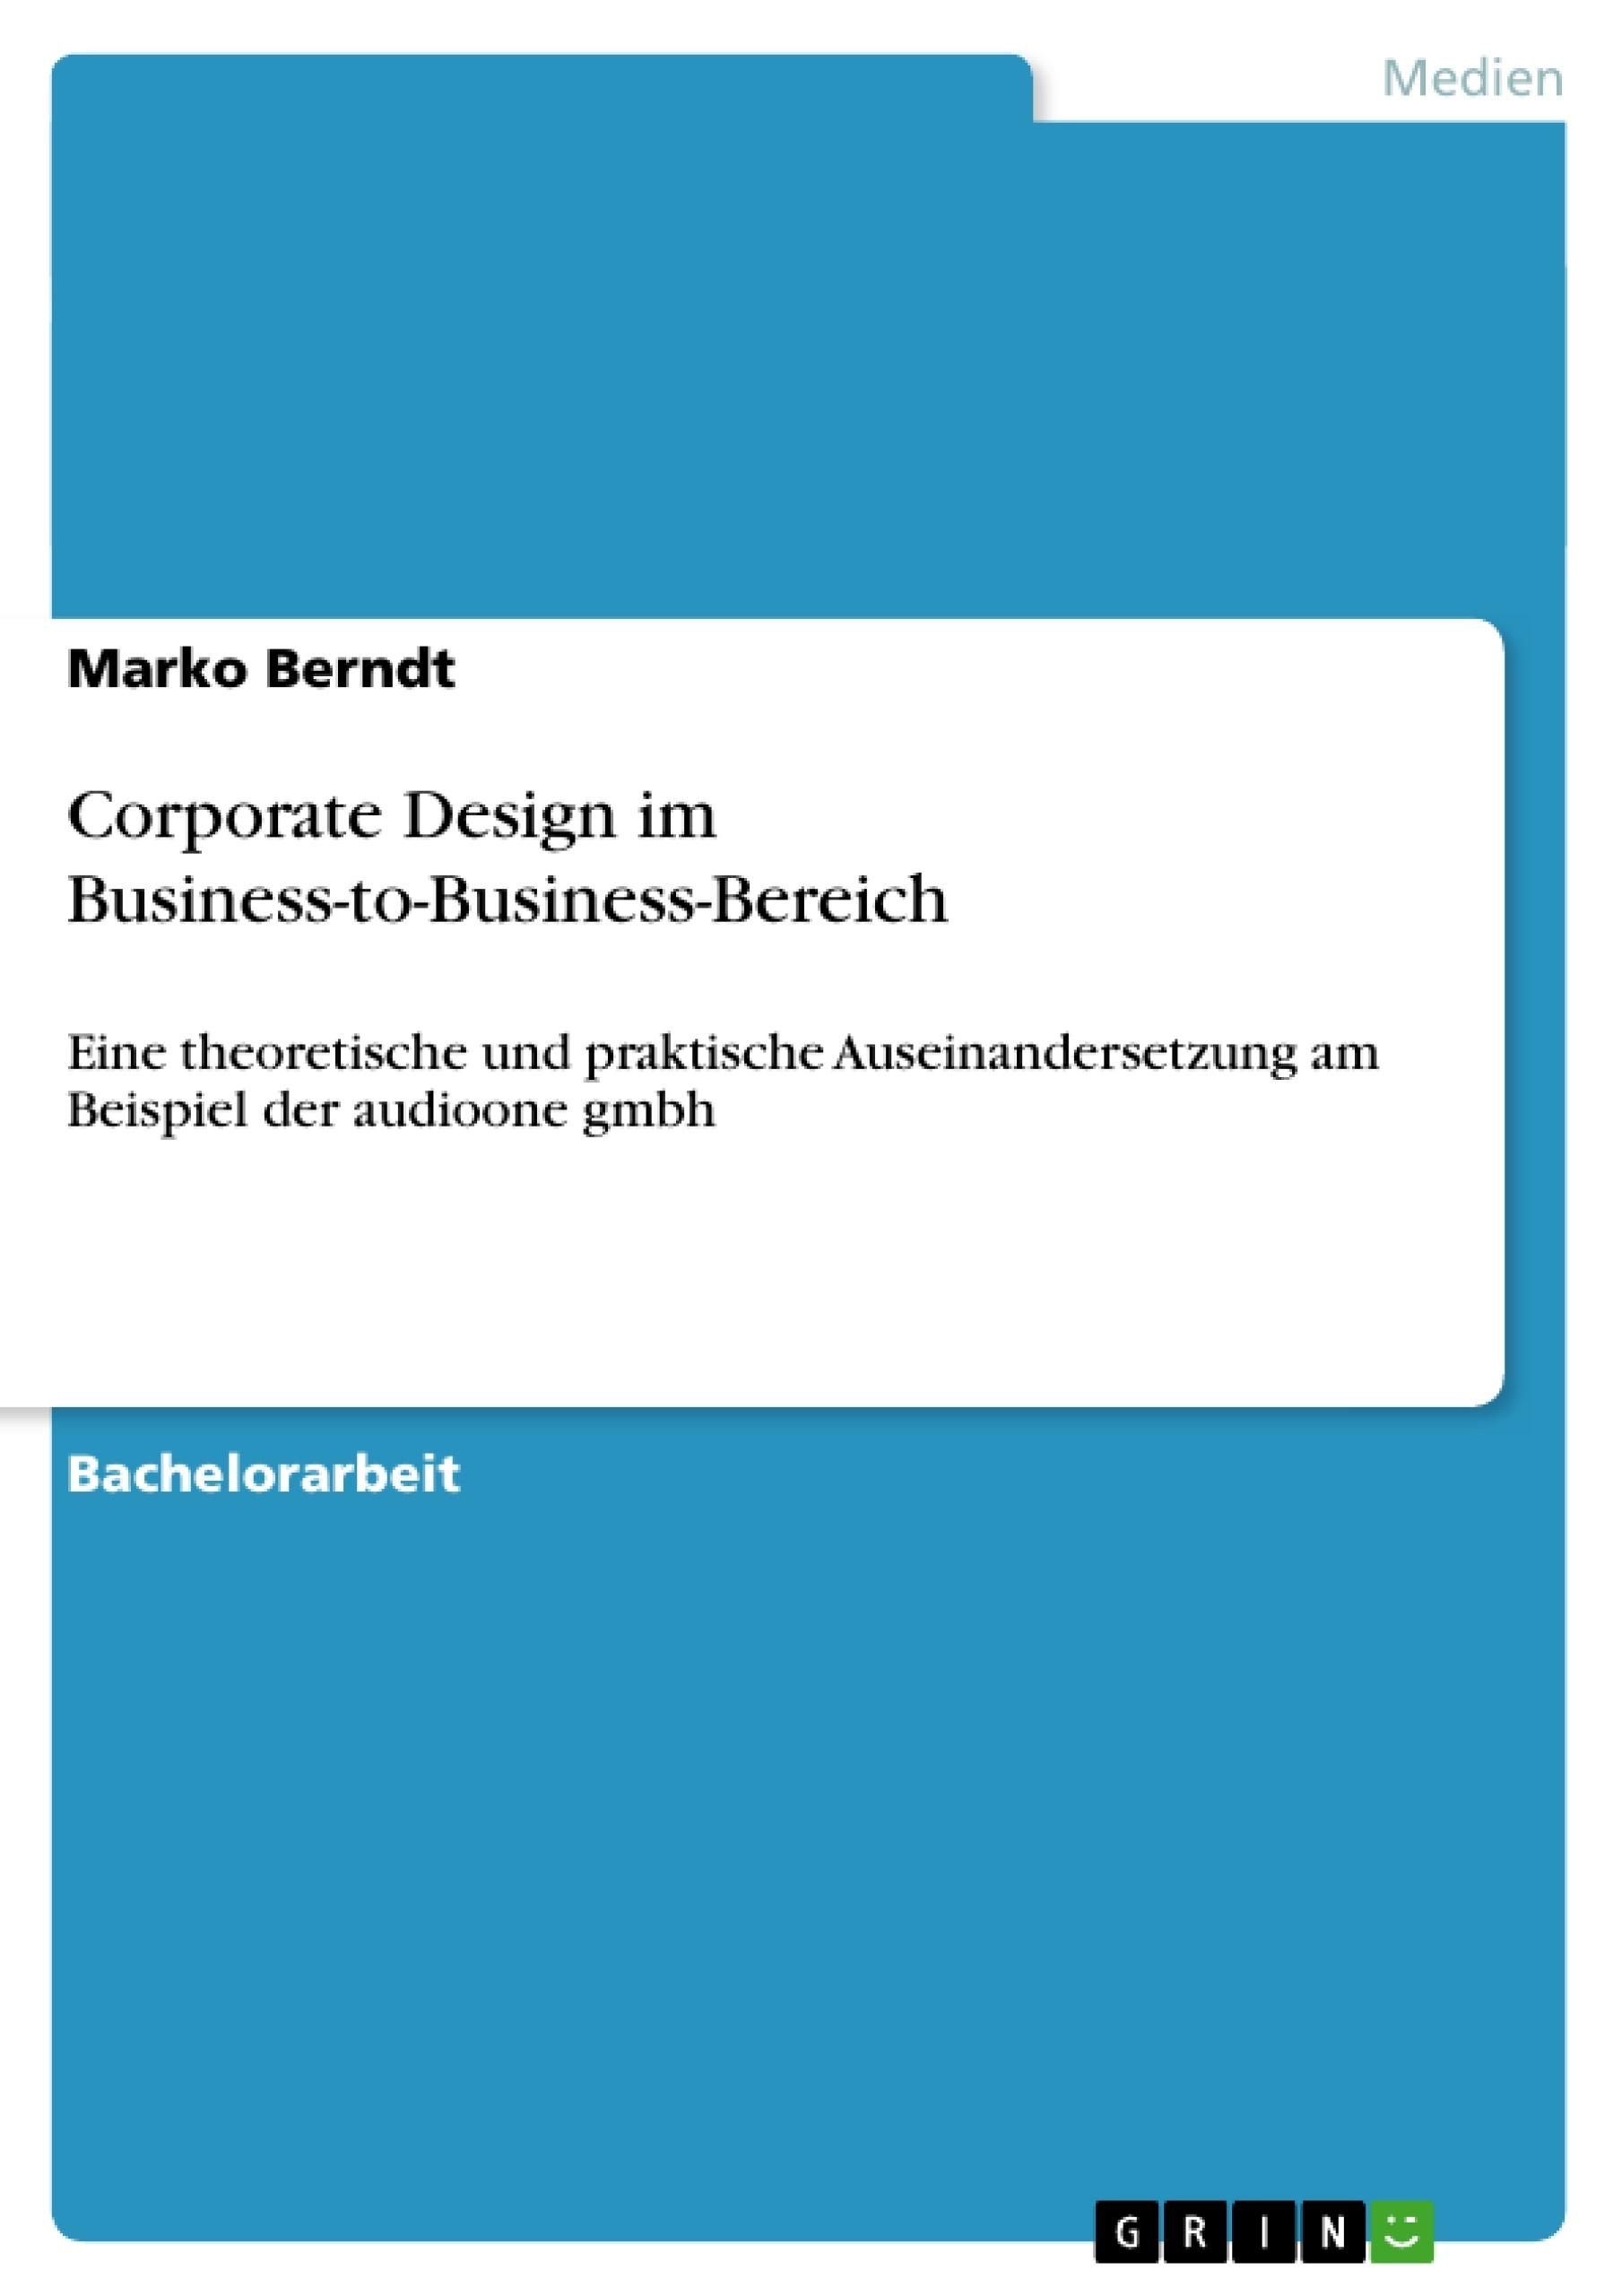 Titel: Corporate Design im Business-to-Business-Bereich